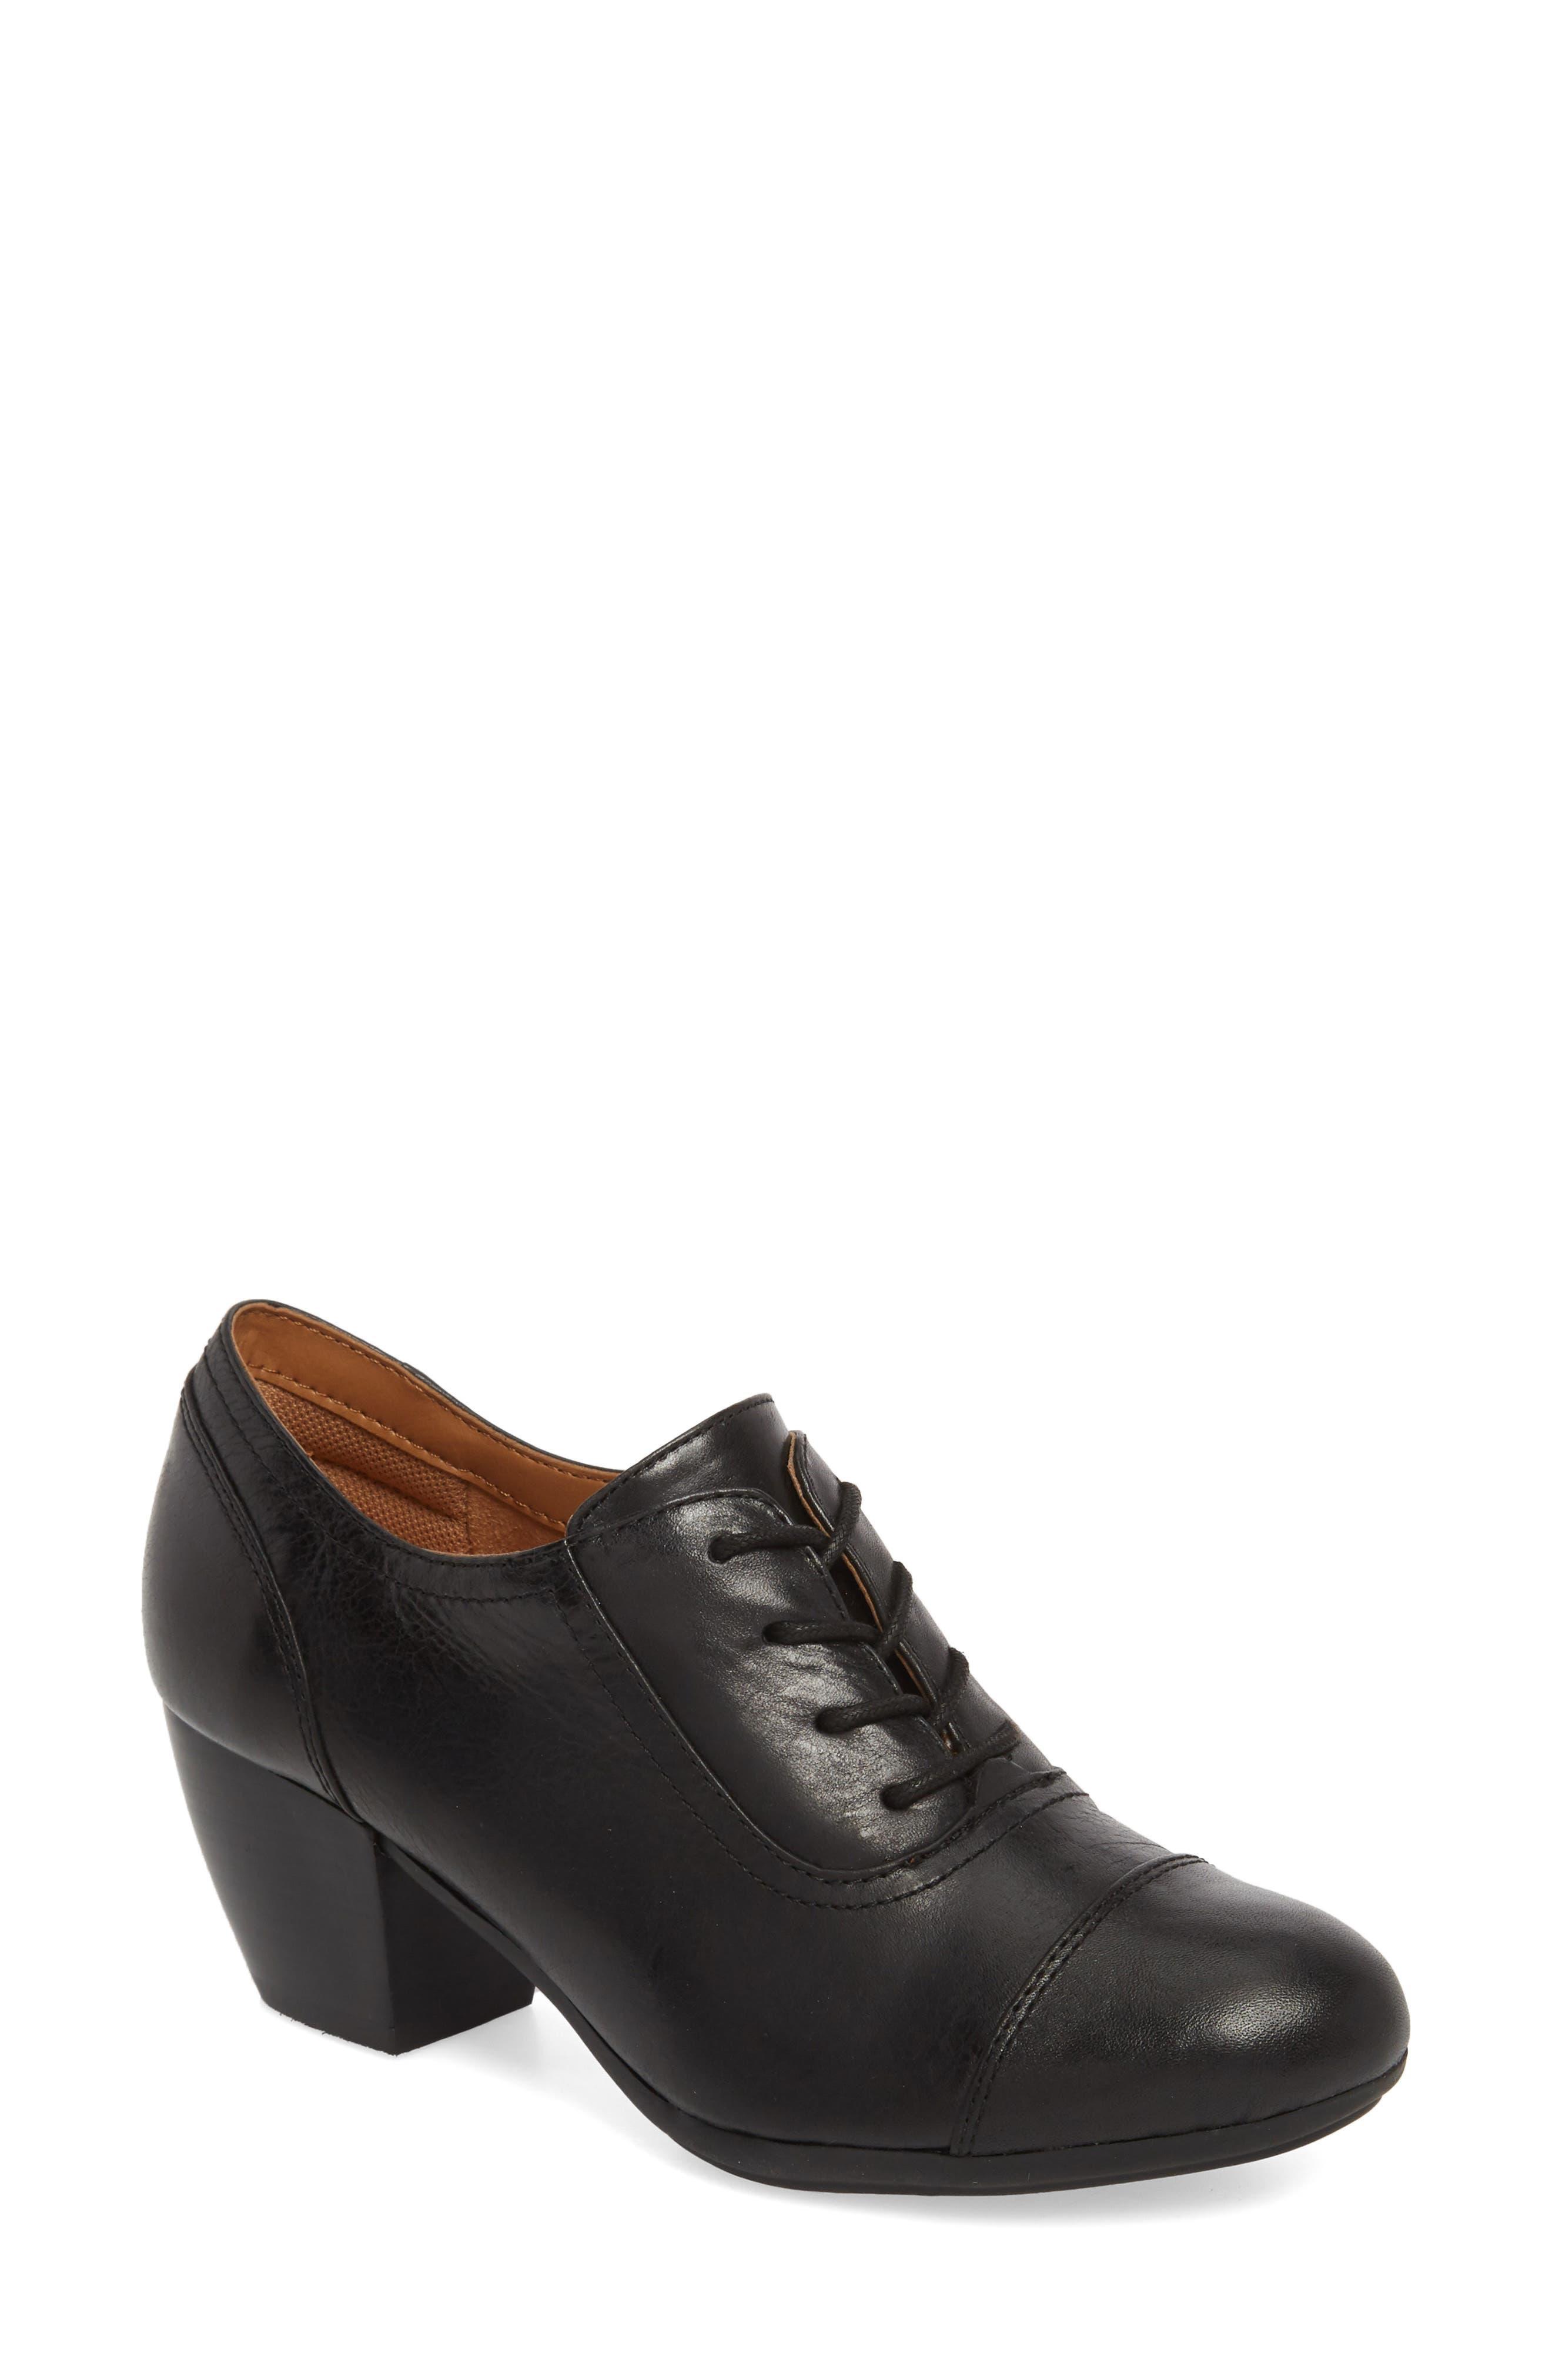 Women's Oxford Shoes – Vintage 1920s, 1930s, 1940s Heels Womens Comfortiva Angelique Pump Size 9.5 M - Black $99.95 AT vintagedancer.com